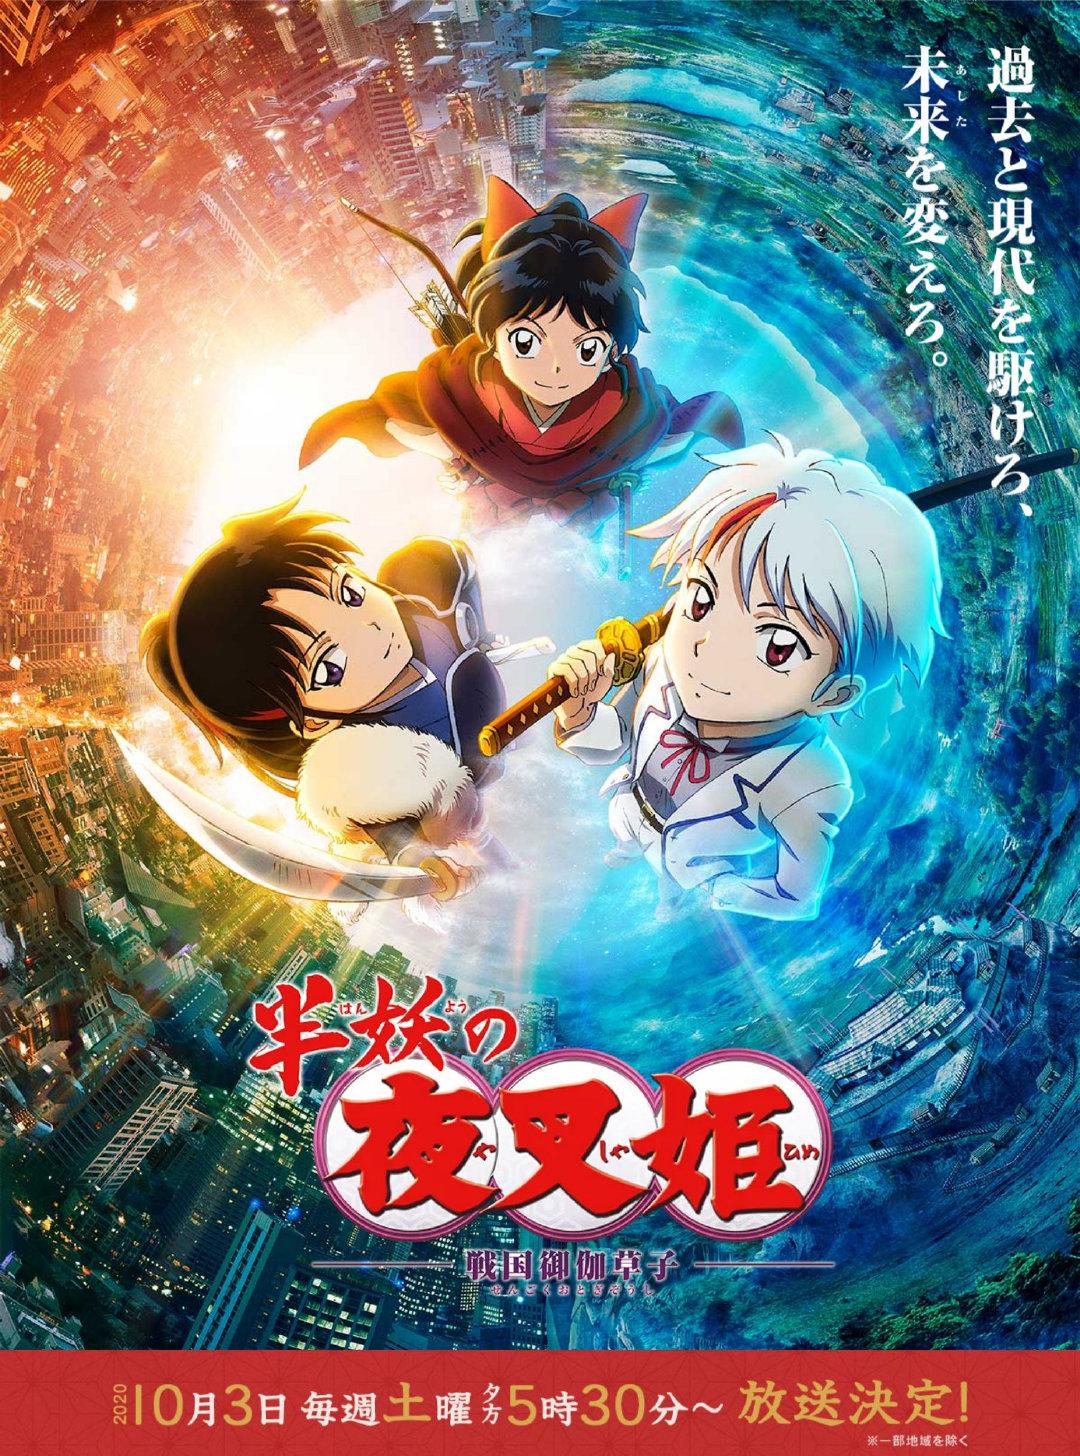 TV动画《半妖的夜叉姬》新视觉图公开,10月3日开播- www.chinavegors.com